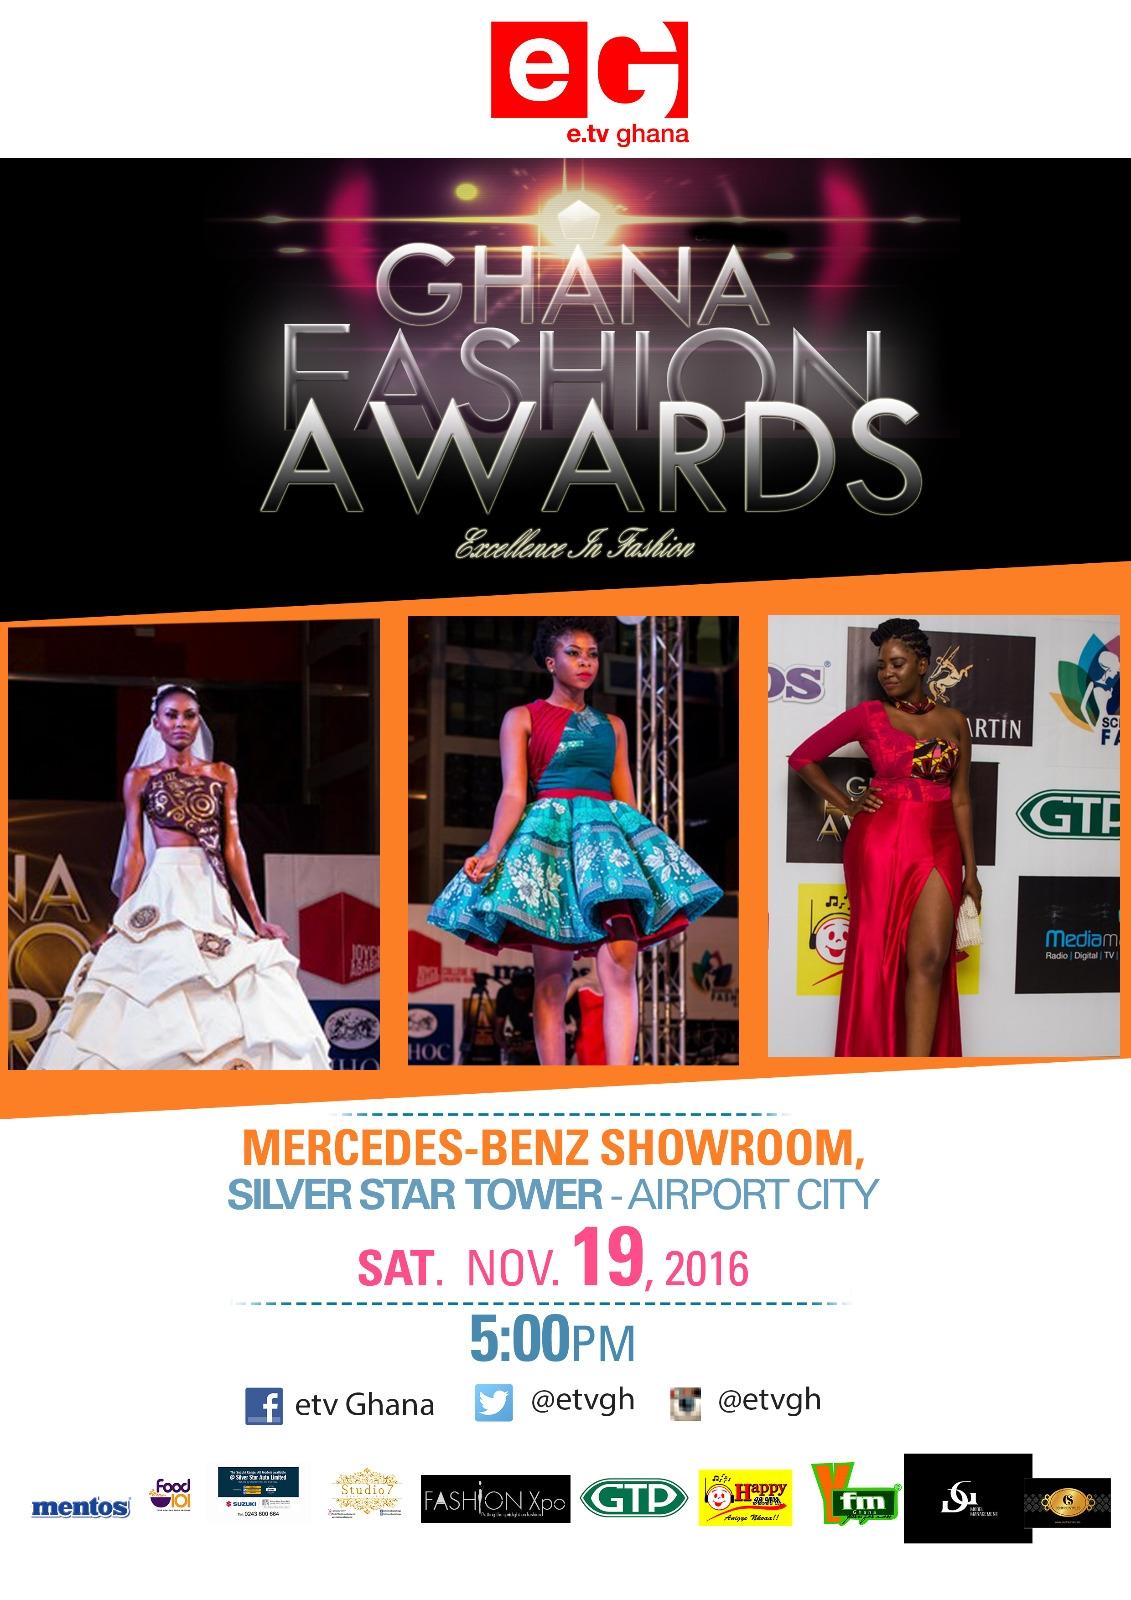 Over 70 Fashion Designers Nominated For 2016 E.Tv Ghana Fashion Awards